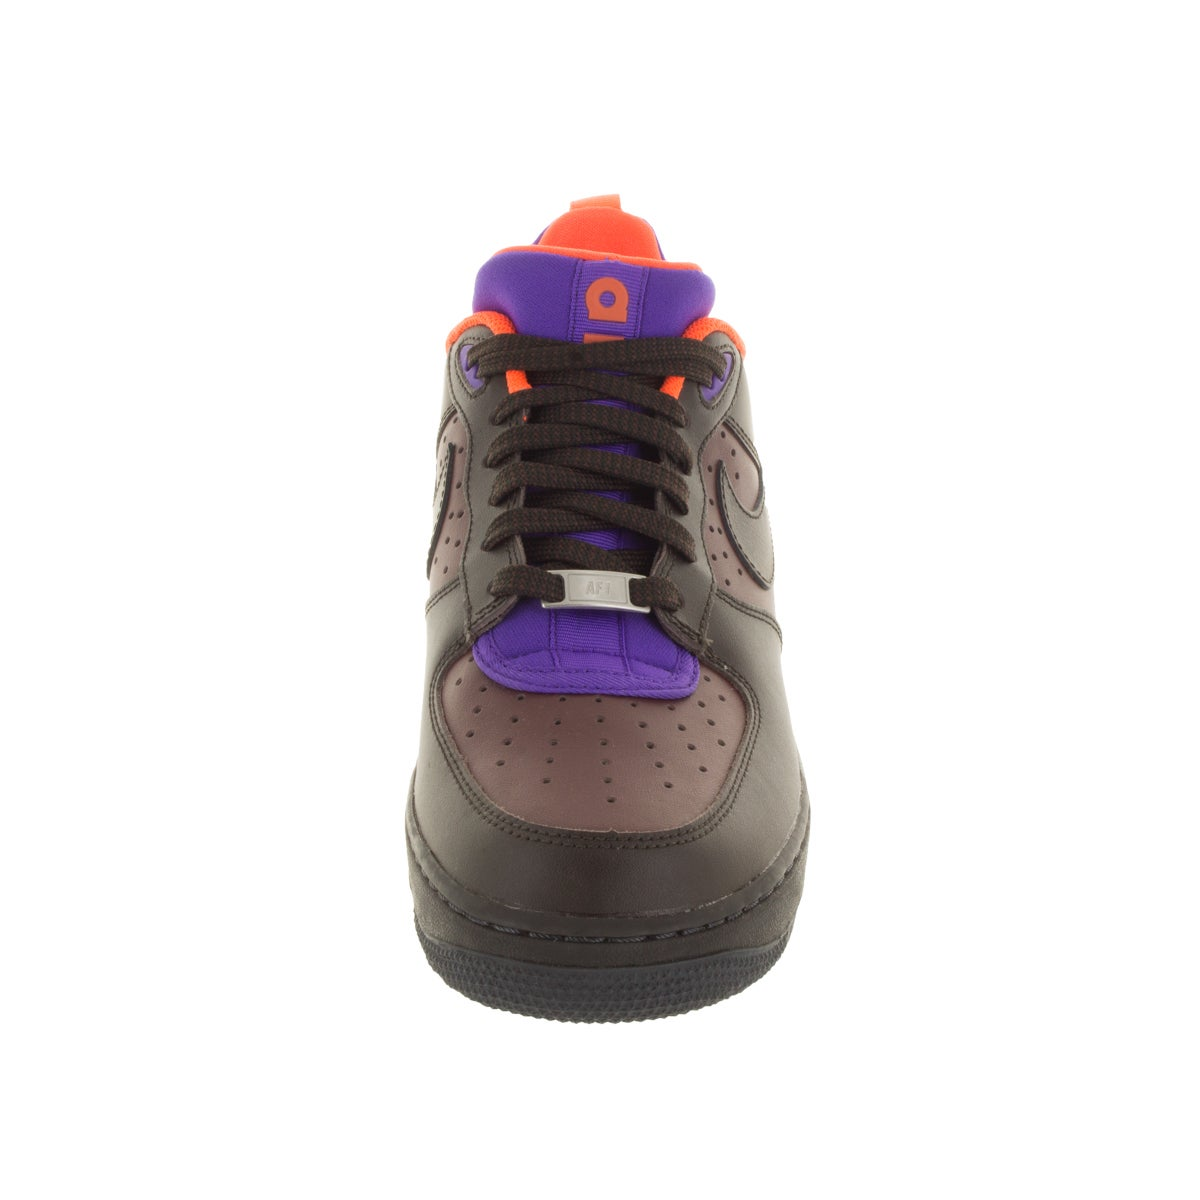 1128efd3c259 Shop Nike Men s Air Force 1 Cmft Mowabb Barkroot Brown Velvet Brown  Basketball Shoe - Free Shipping Today - Overstock - 12330930